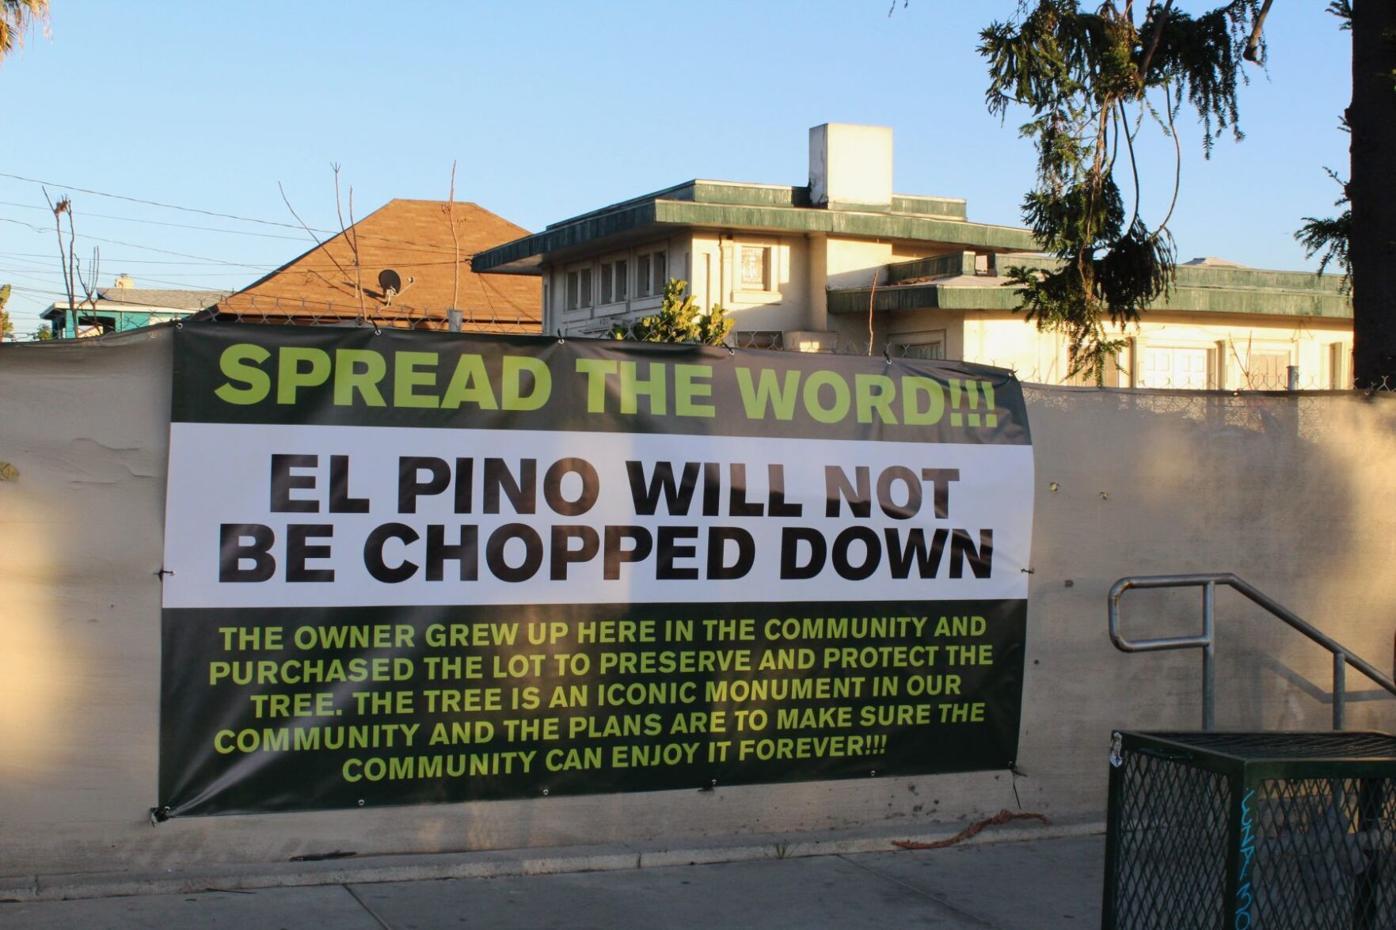 El Pino will not be chopped